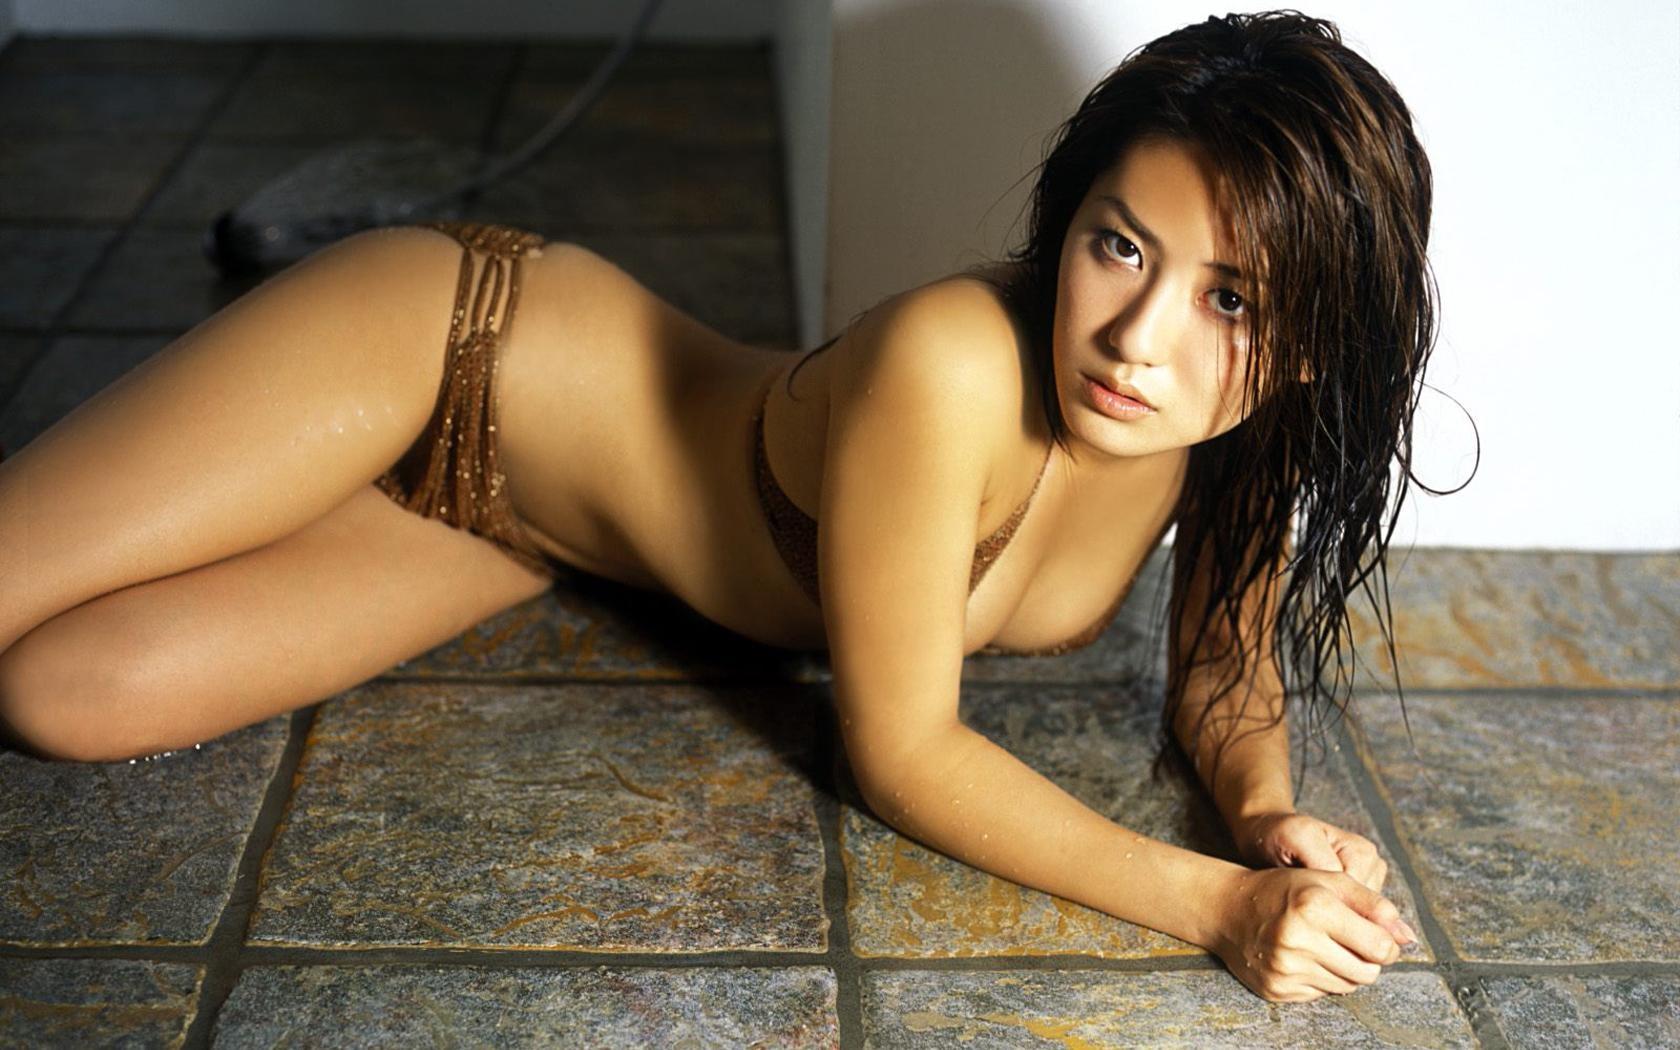 nude pics of asian women  249925